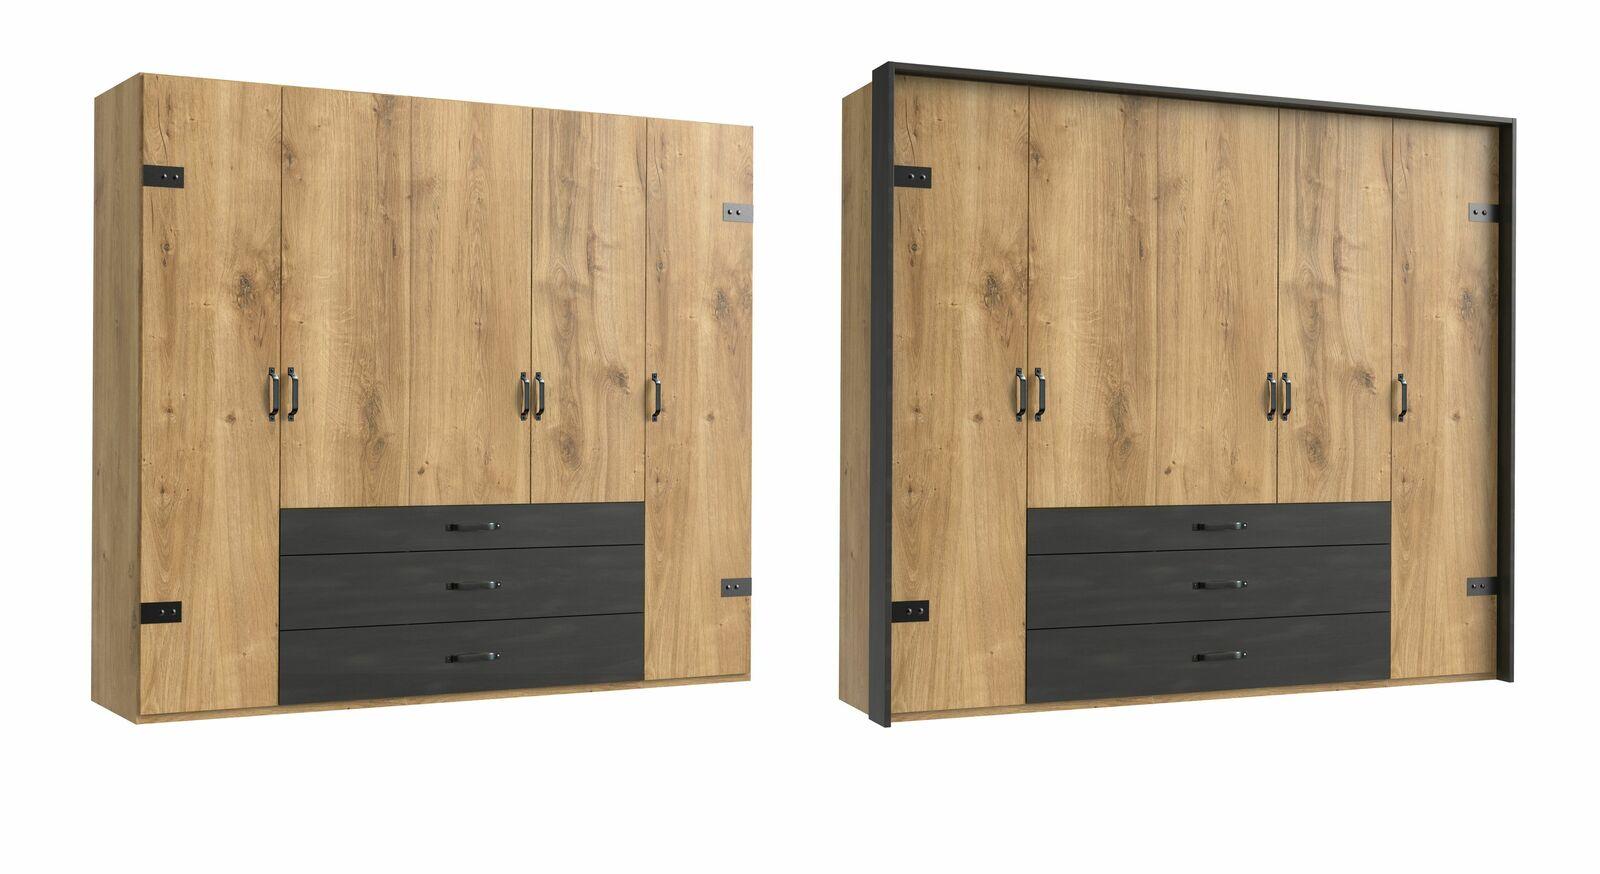 5-türige Variante des Funktions-Kleiderschranks Lakewood